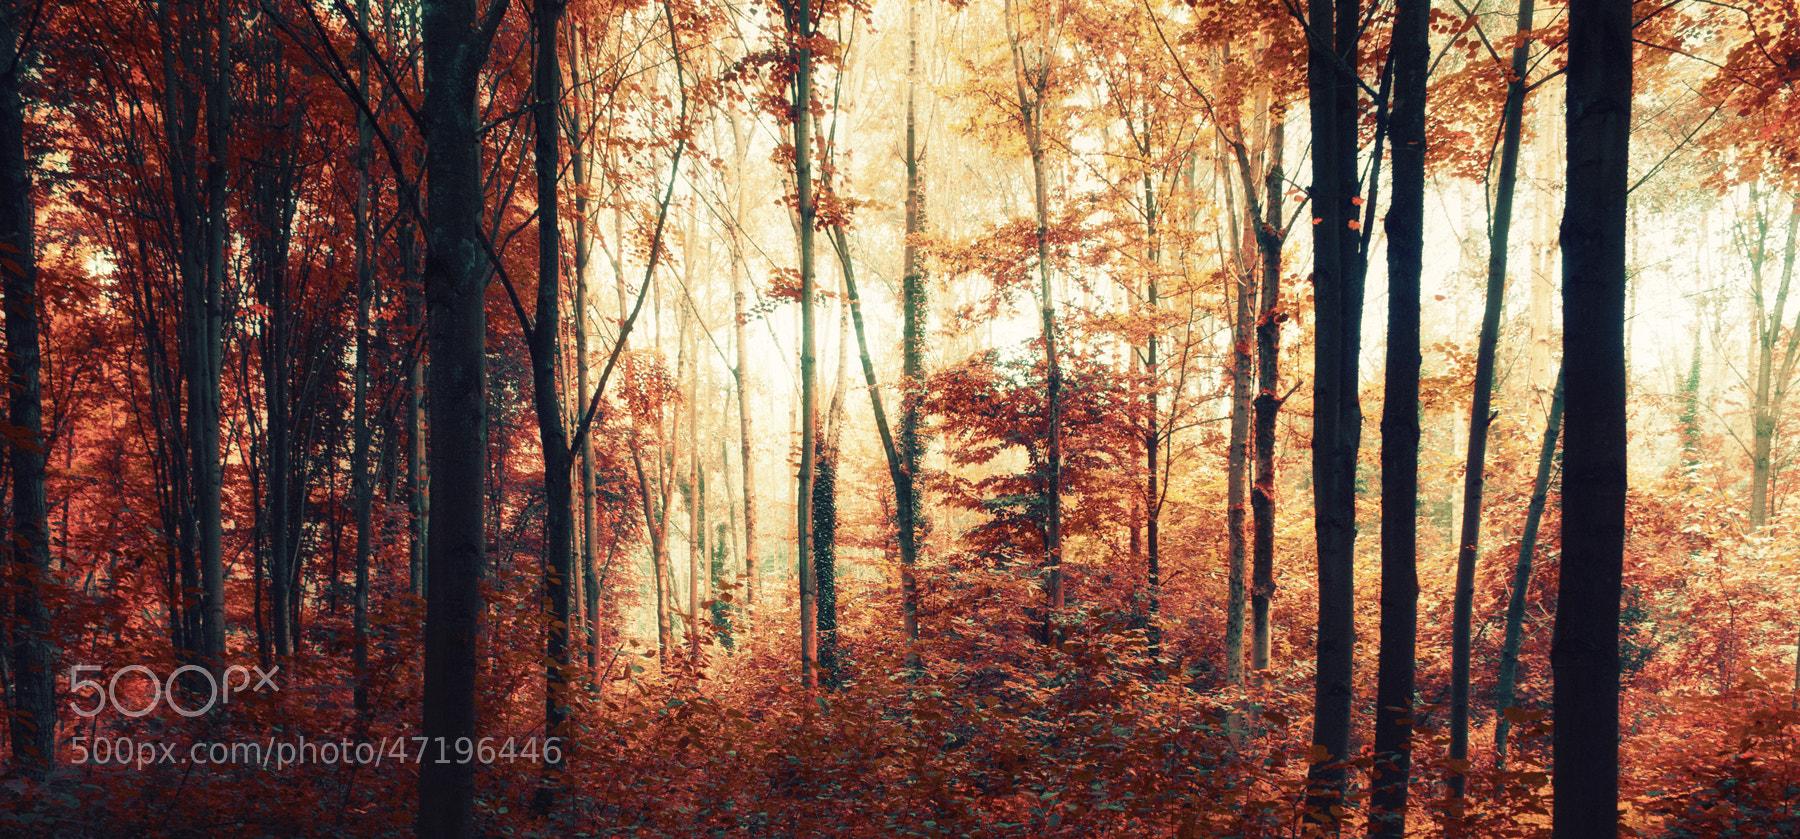 Photograph Untitled by Gusti Yogiswara on 500px